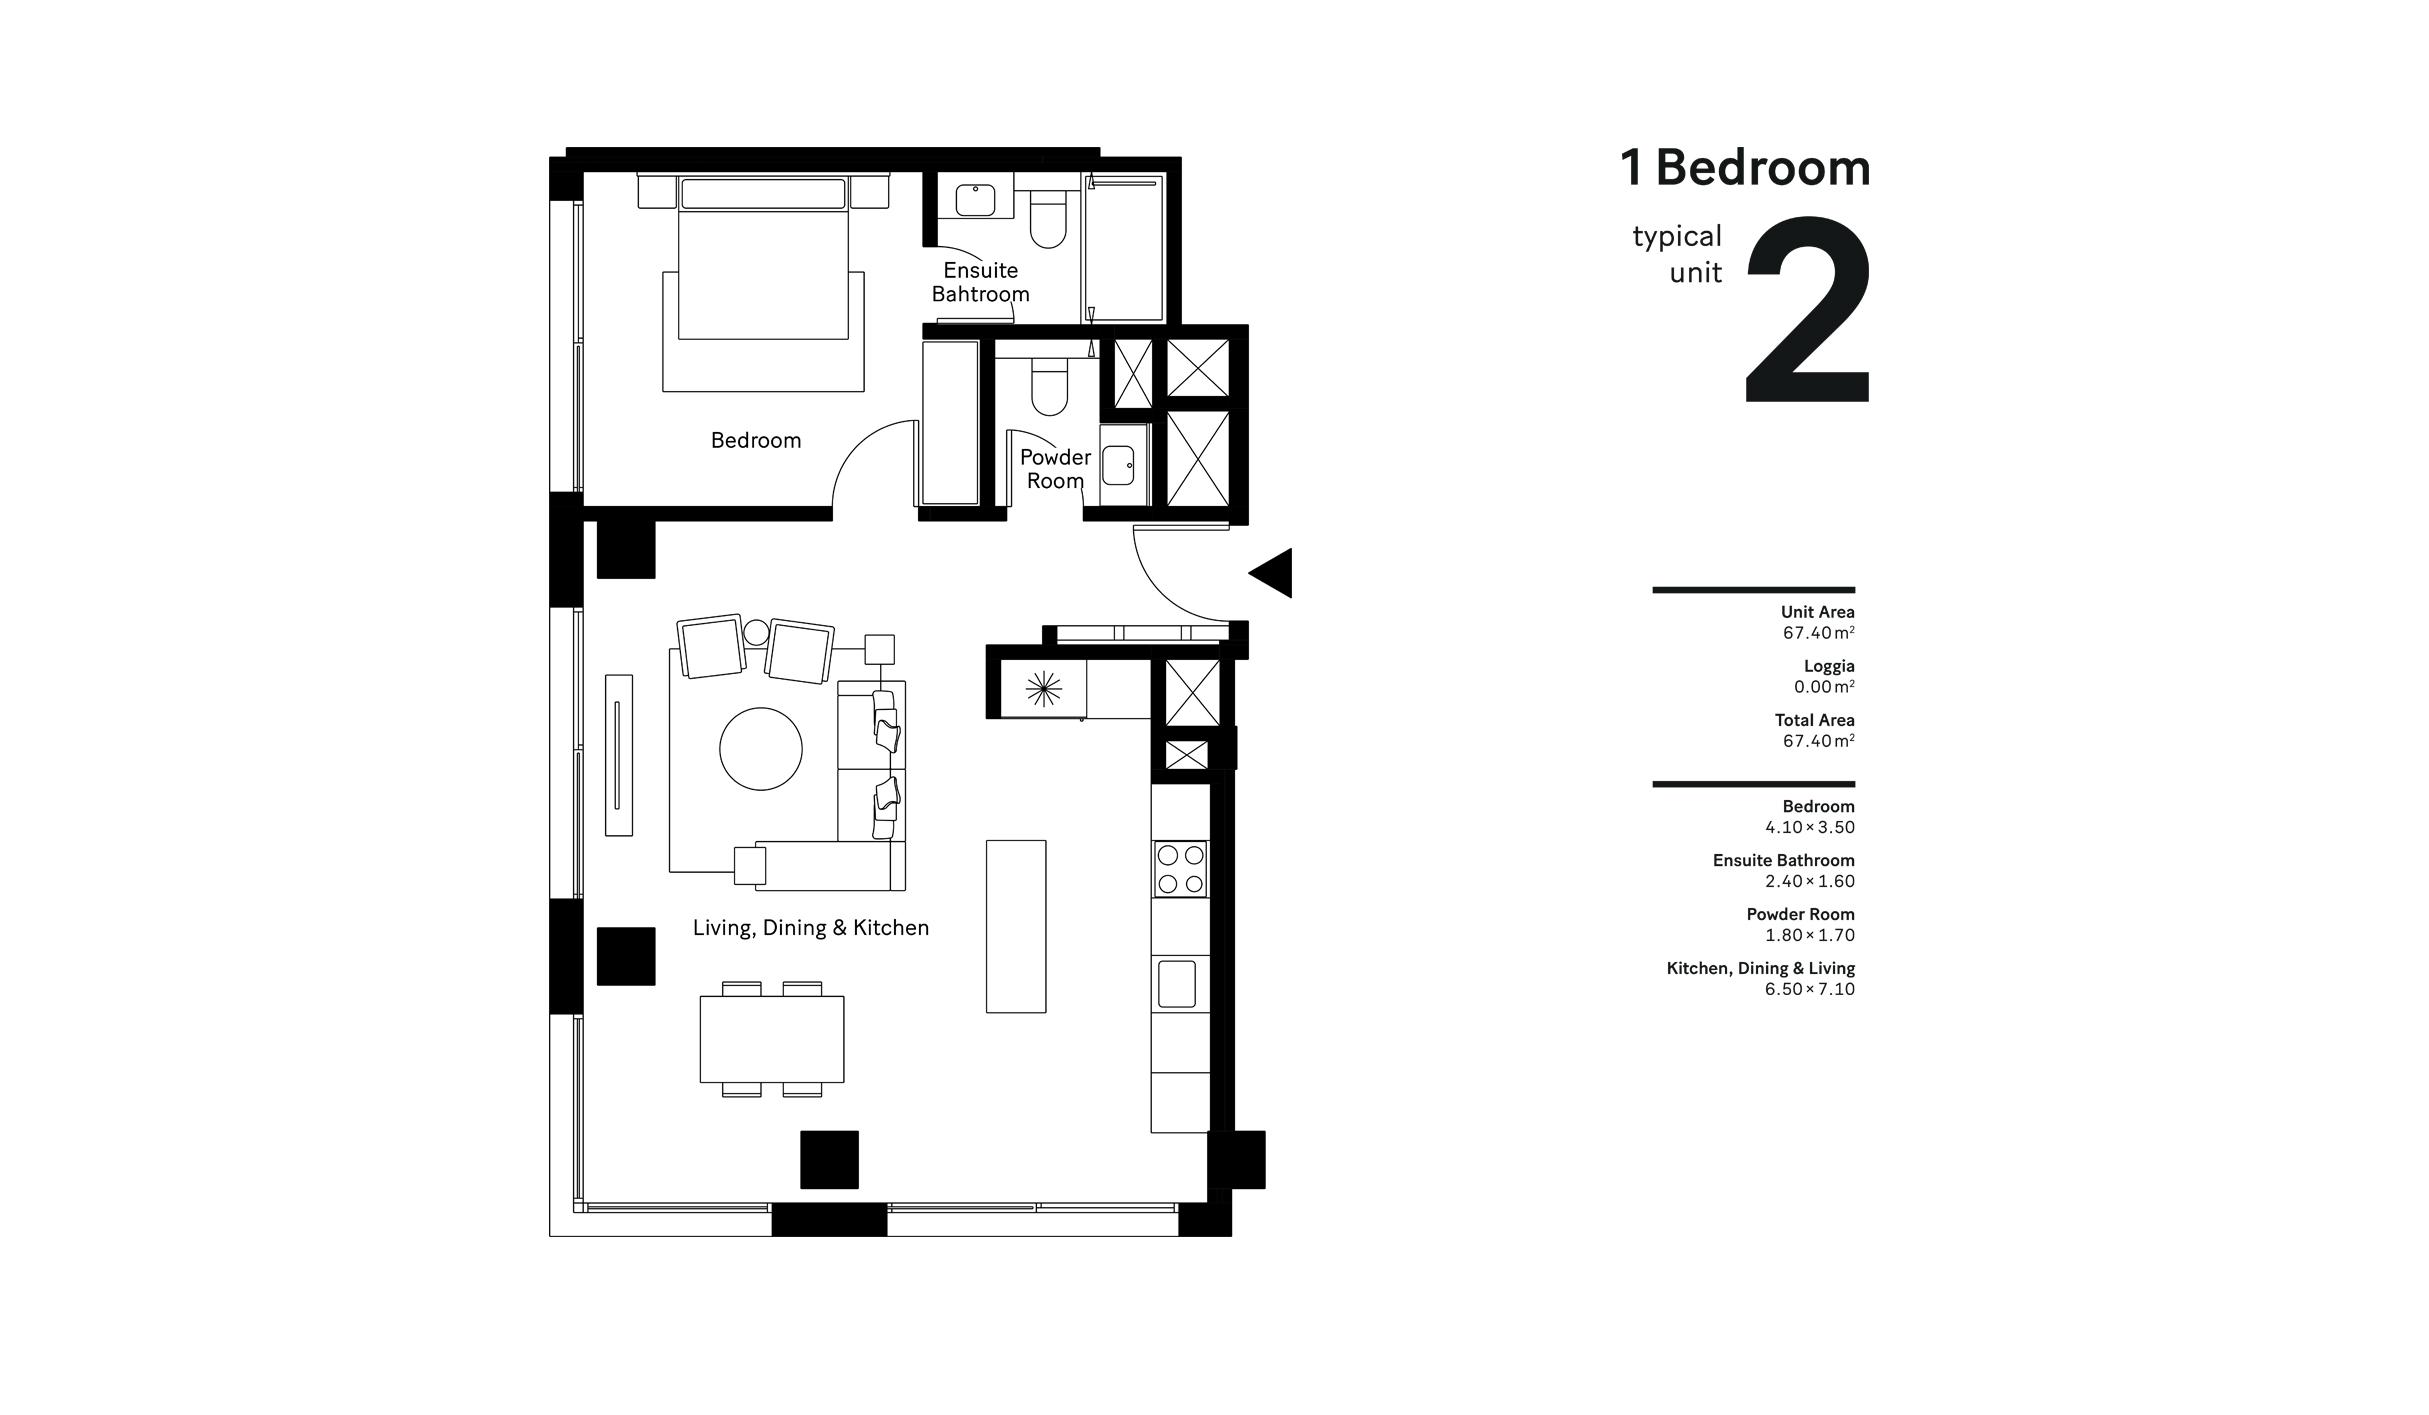 1 Bedroom  Size - 67.40 sqm